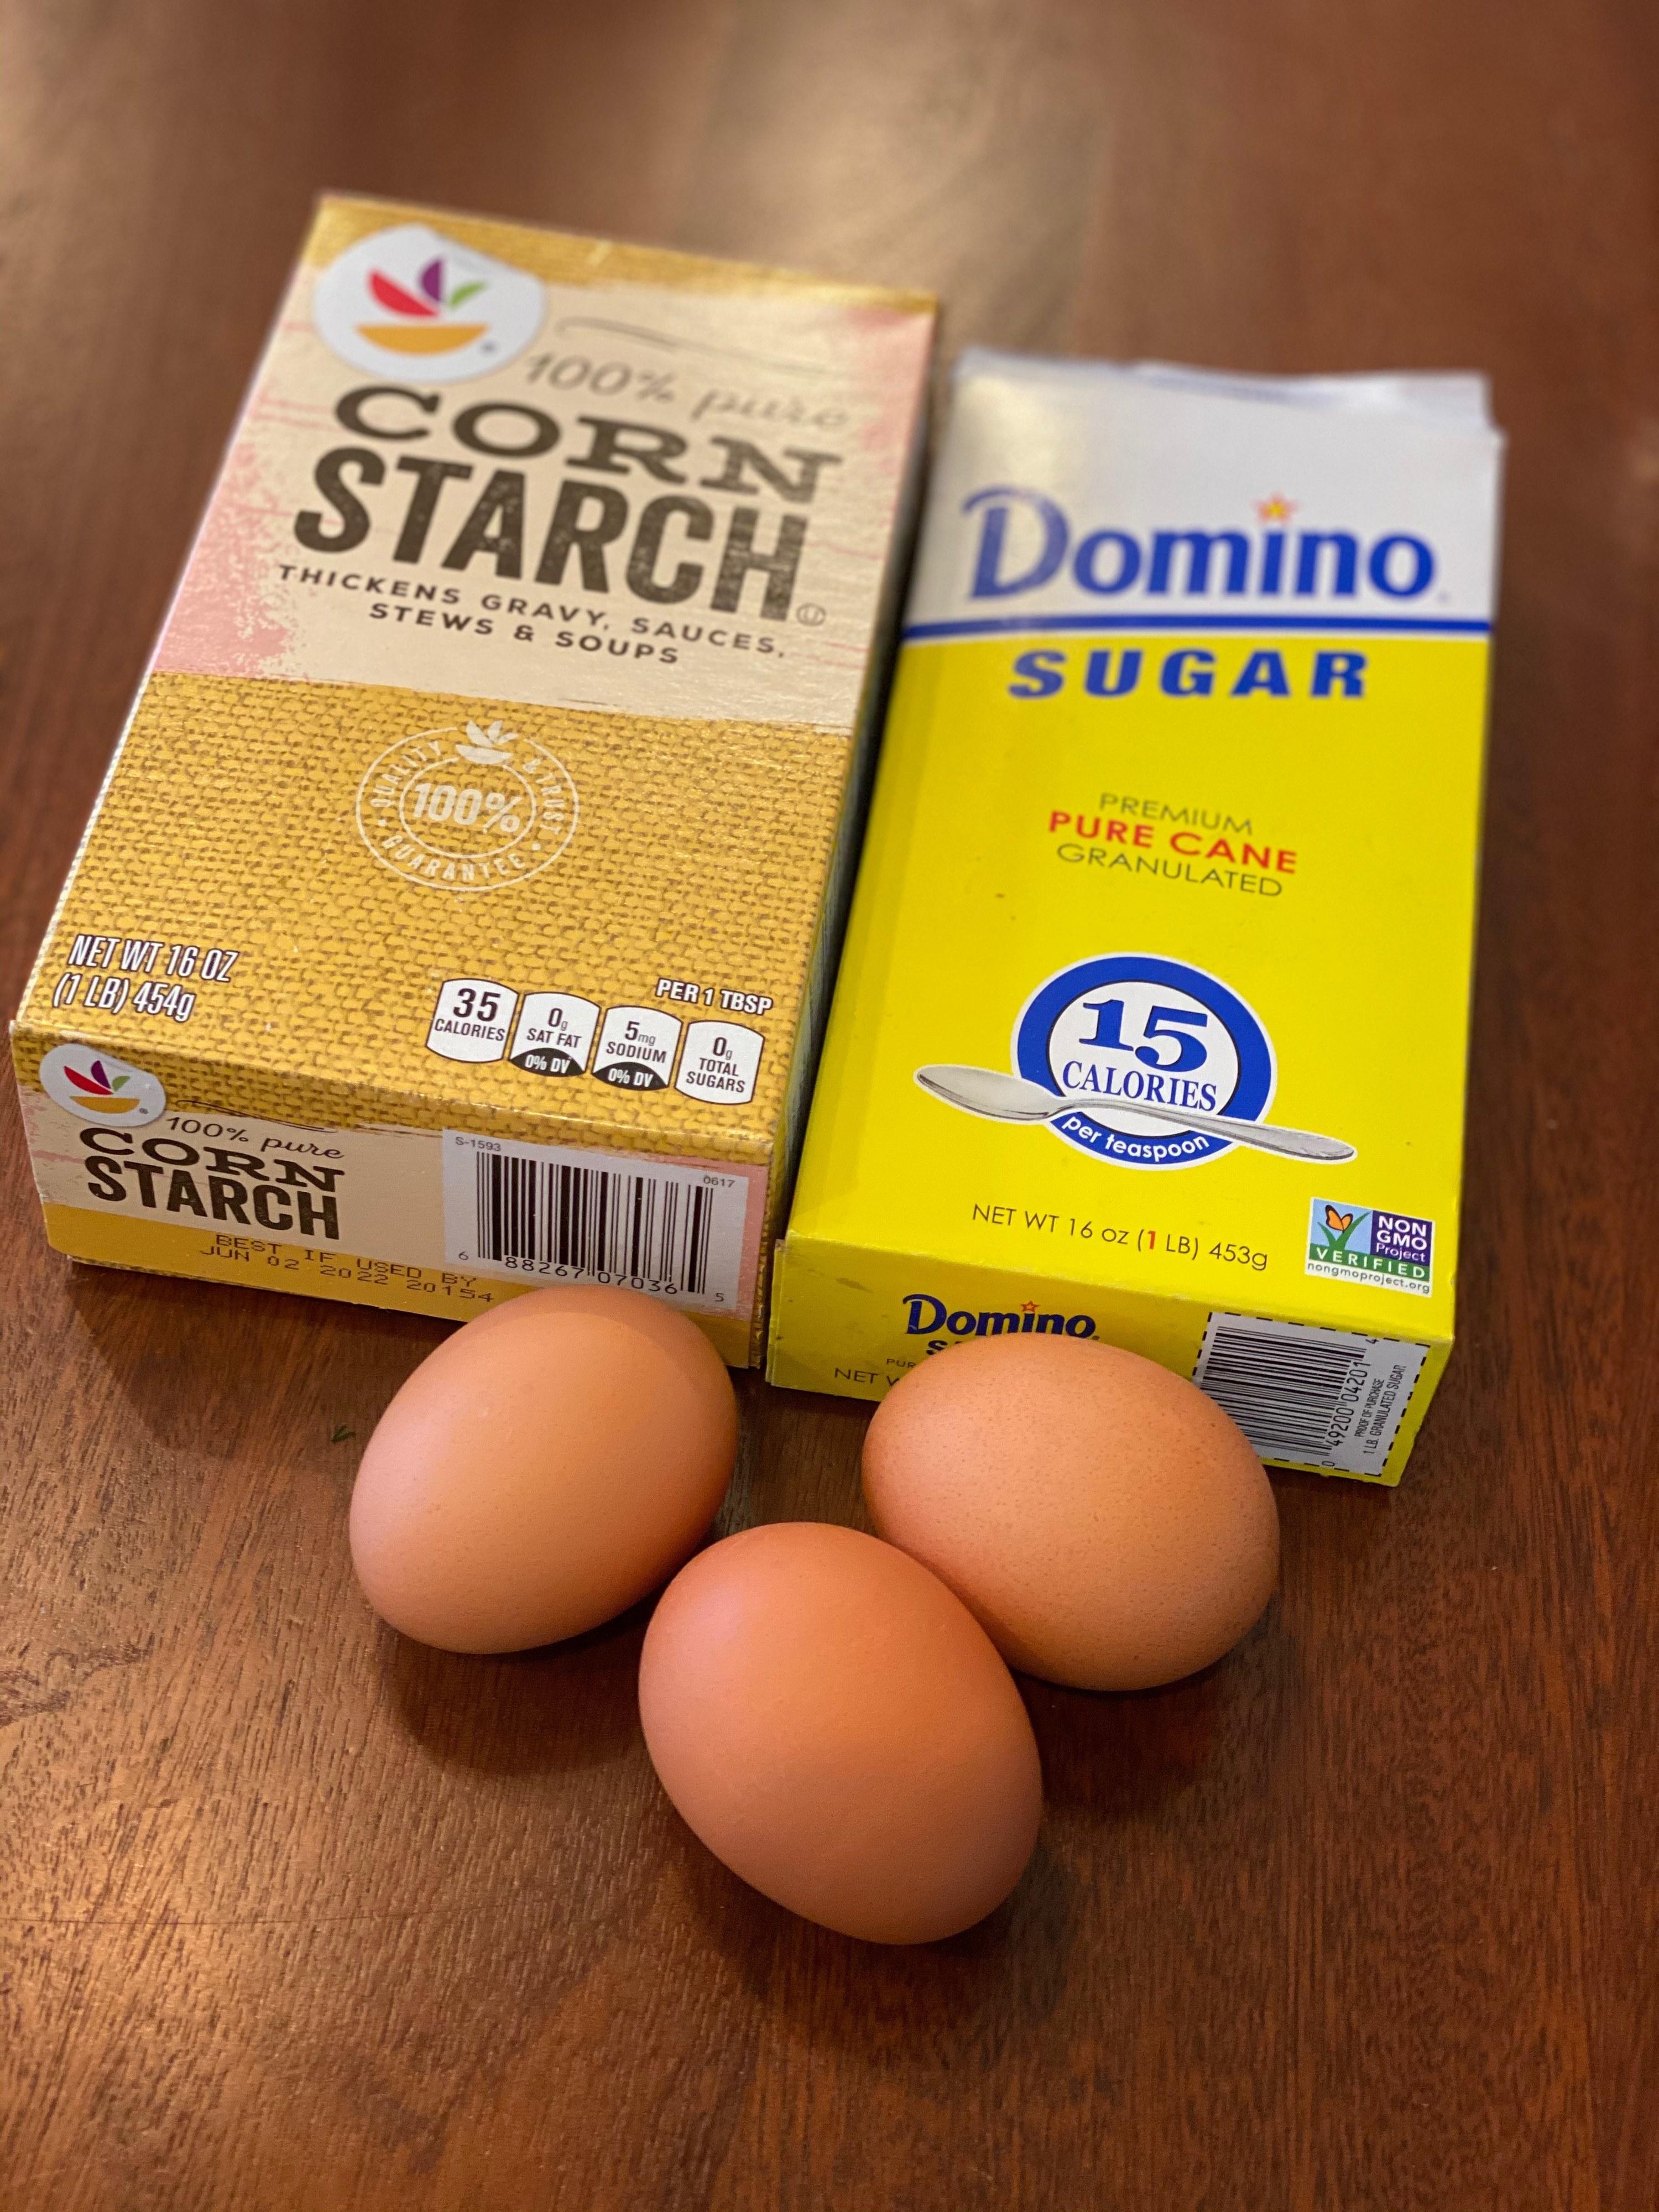 Three eggs, sugar, and cornstarch on a wooden countertop for cloud bread.